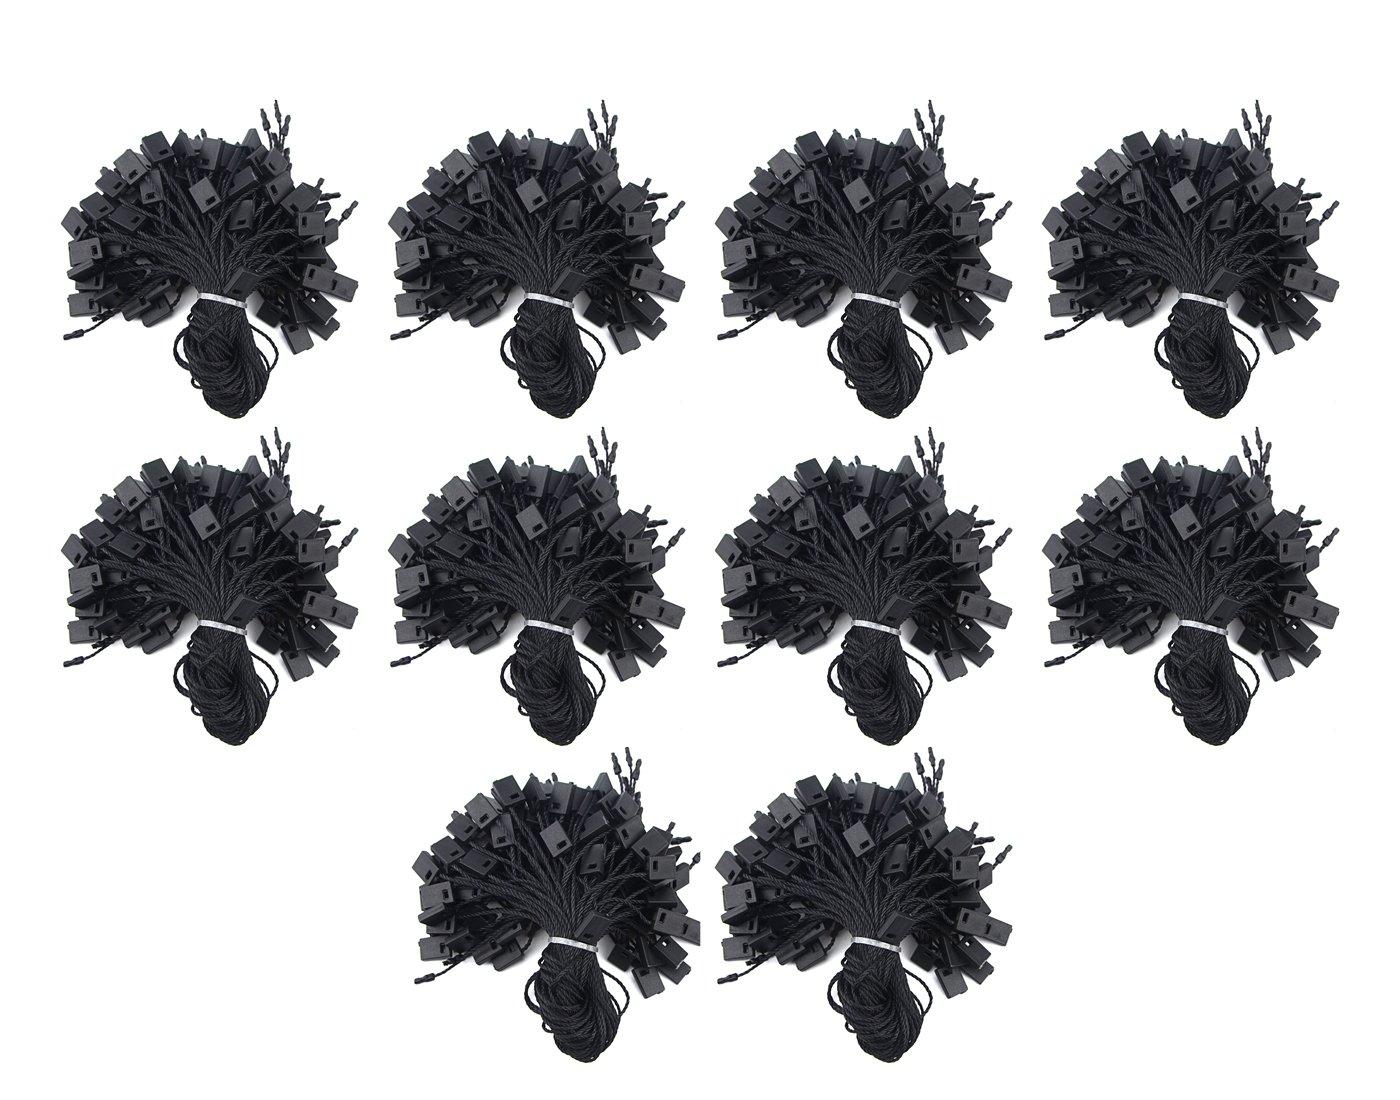 WGCD 1000PCS Black Nylon Clothing Hang Tag String Snap Lock Pin Loop Fasteners Hook Tie Labeling Tagging Supplies